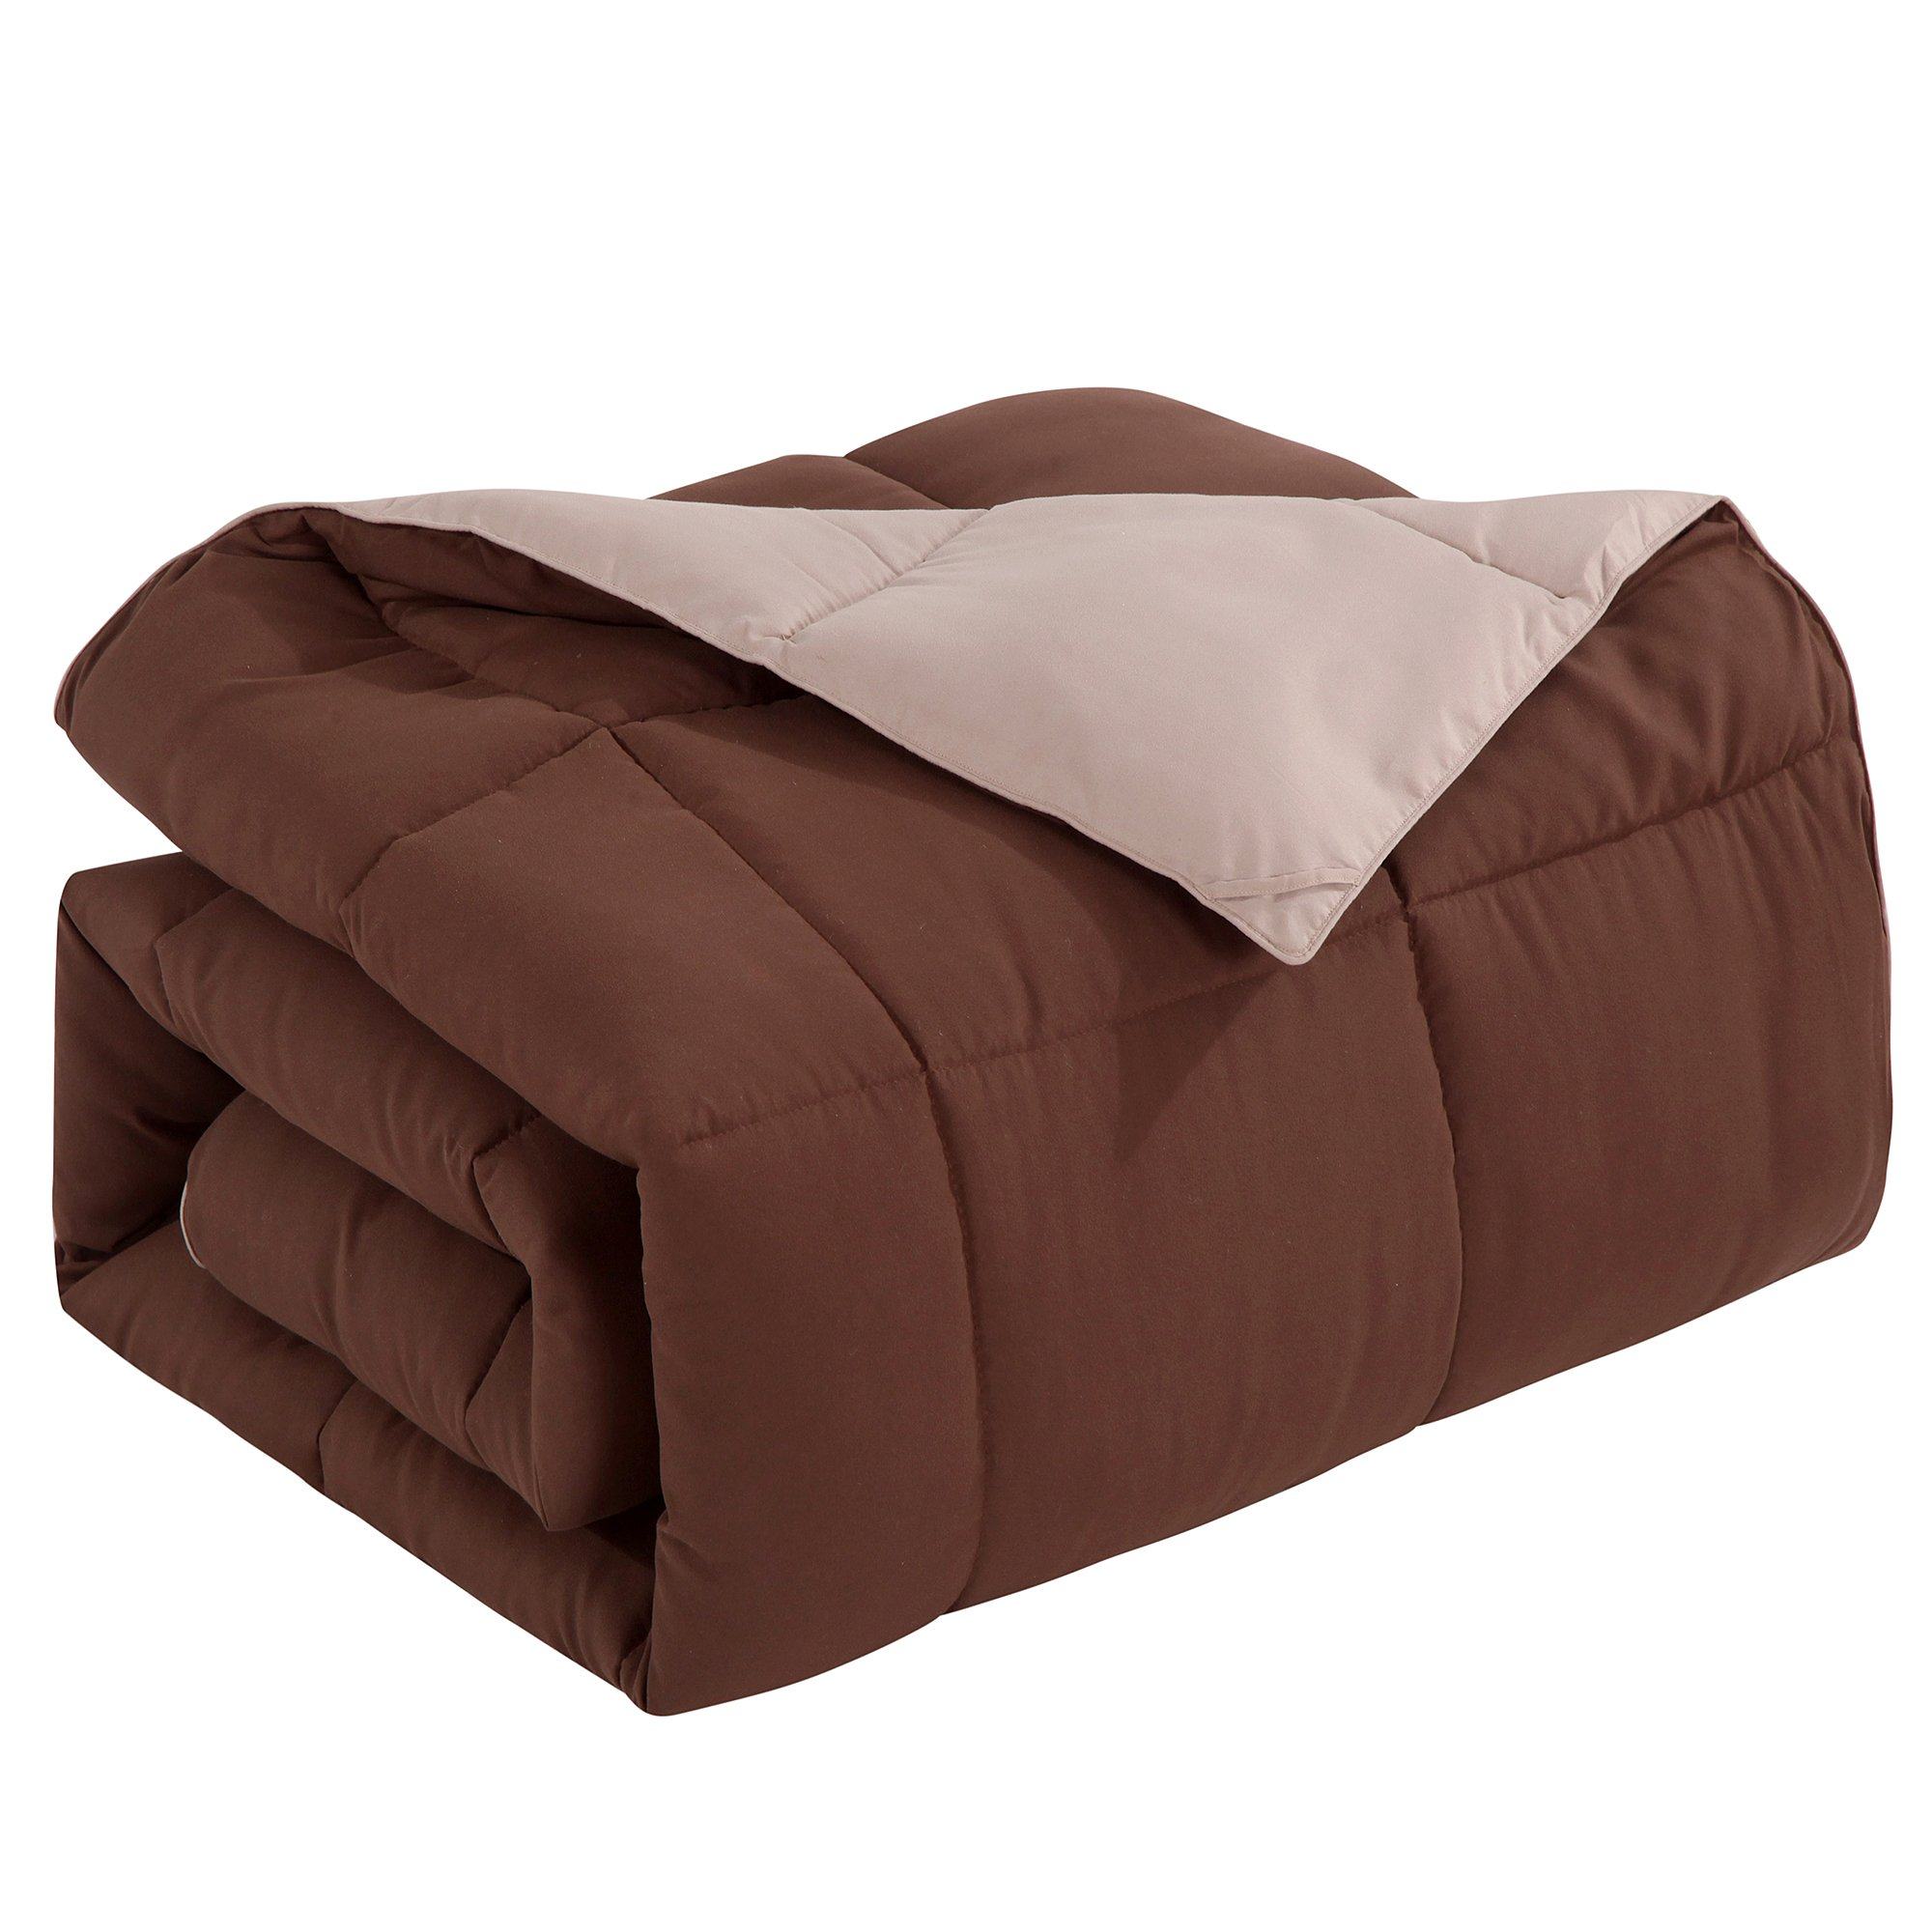 Homelike Moment Lightweight Reversible Comforter Down Alternative Twin All Season Duvet Insert Microfiber Comforter Chocolate Brown/Khaki Twin/Twin XL Size with Corner Tabs Hypoallergenic